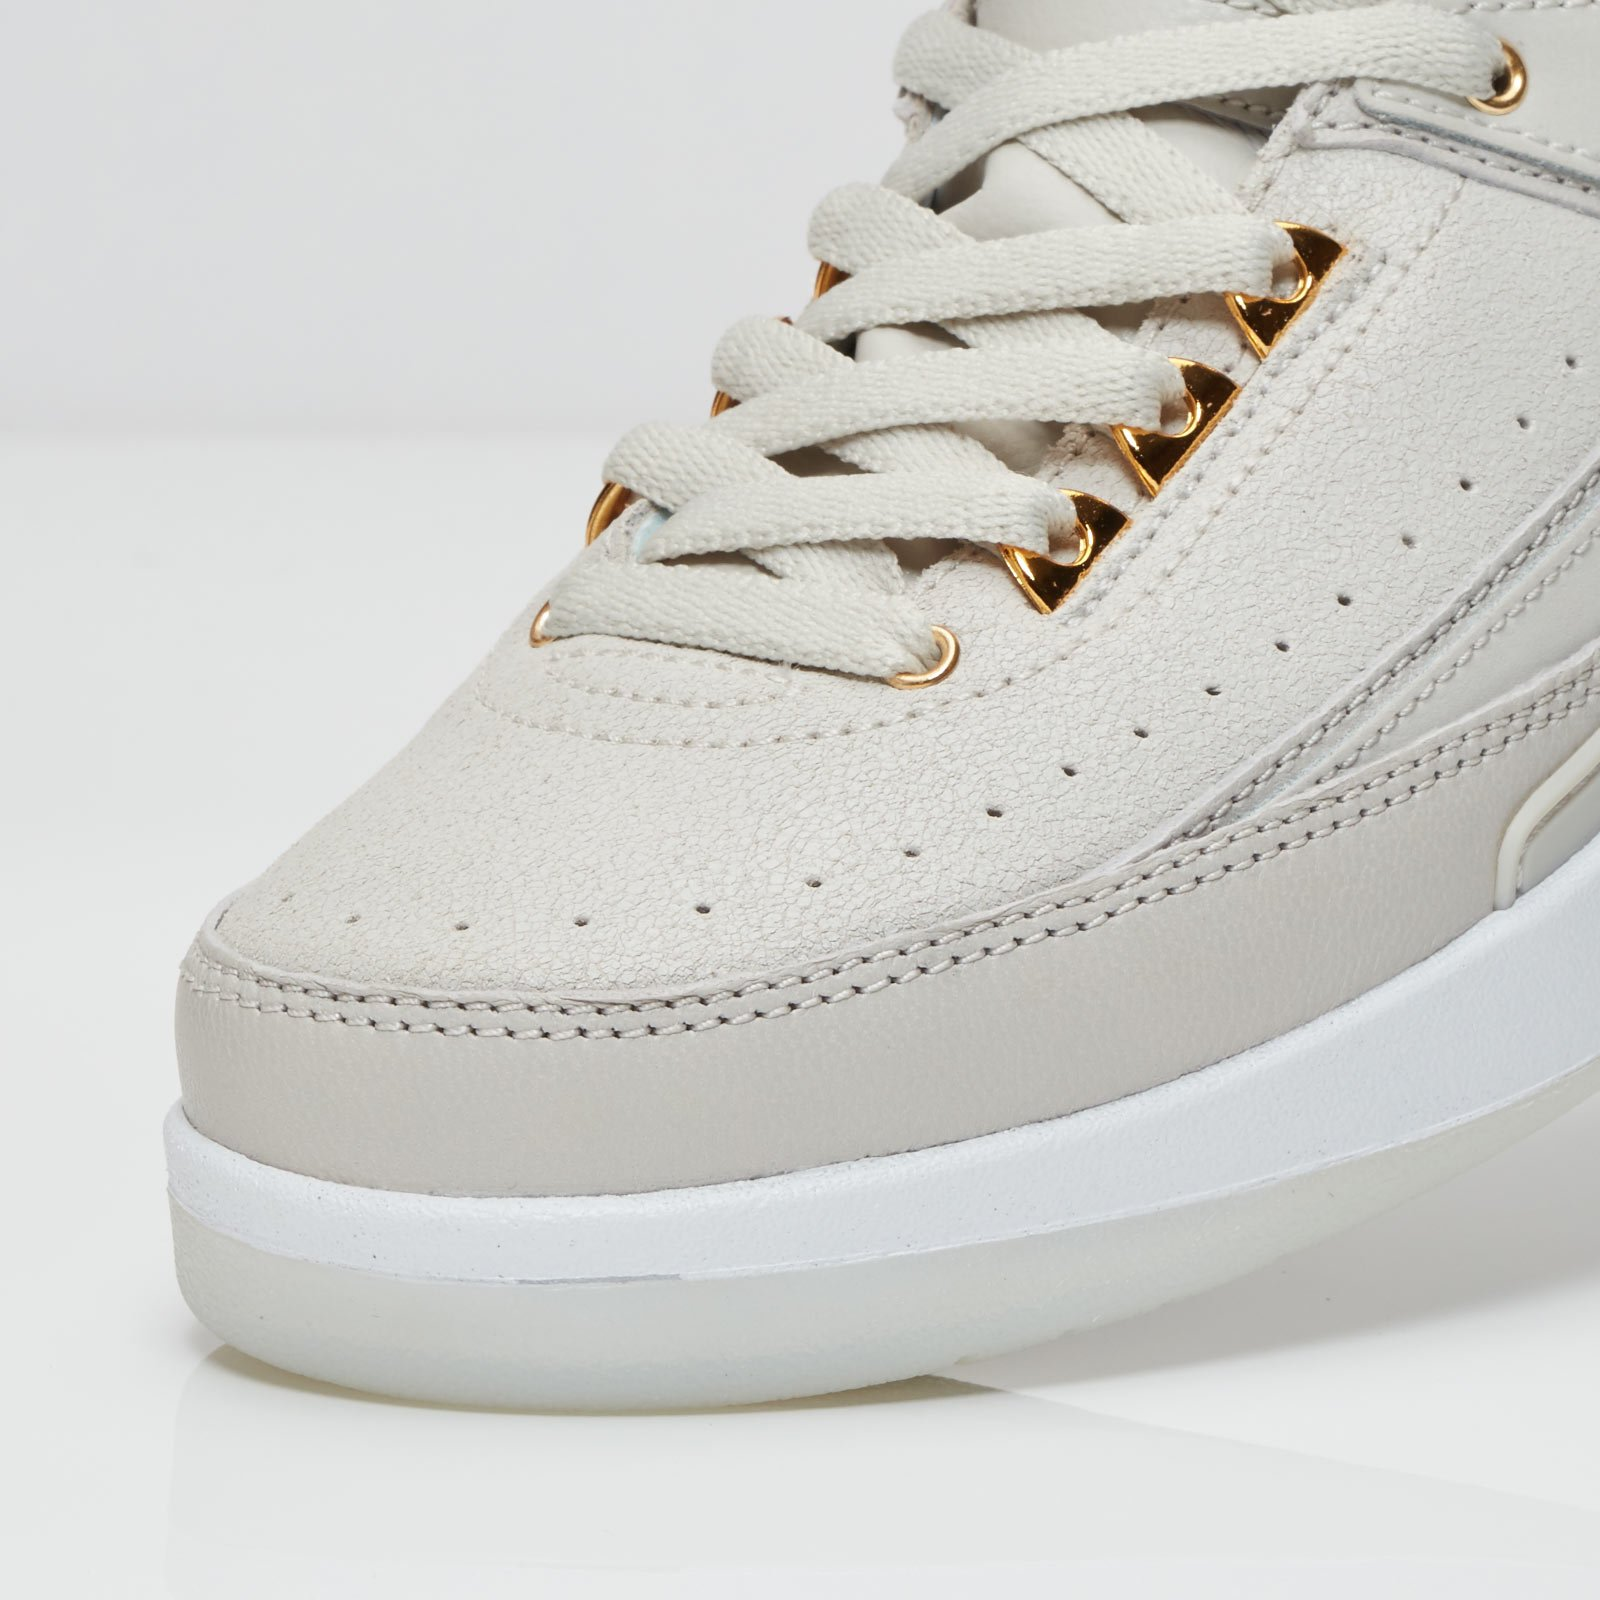 d2bcac5103633b Jordan Brand Air Jordan 2 Q54 (GS) - 866034-001 - Sneakersnstuff ...